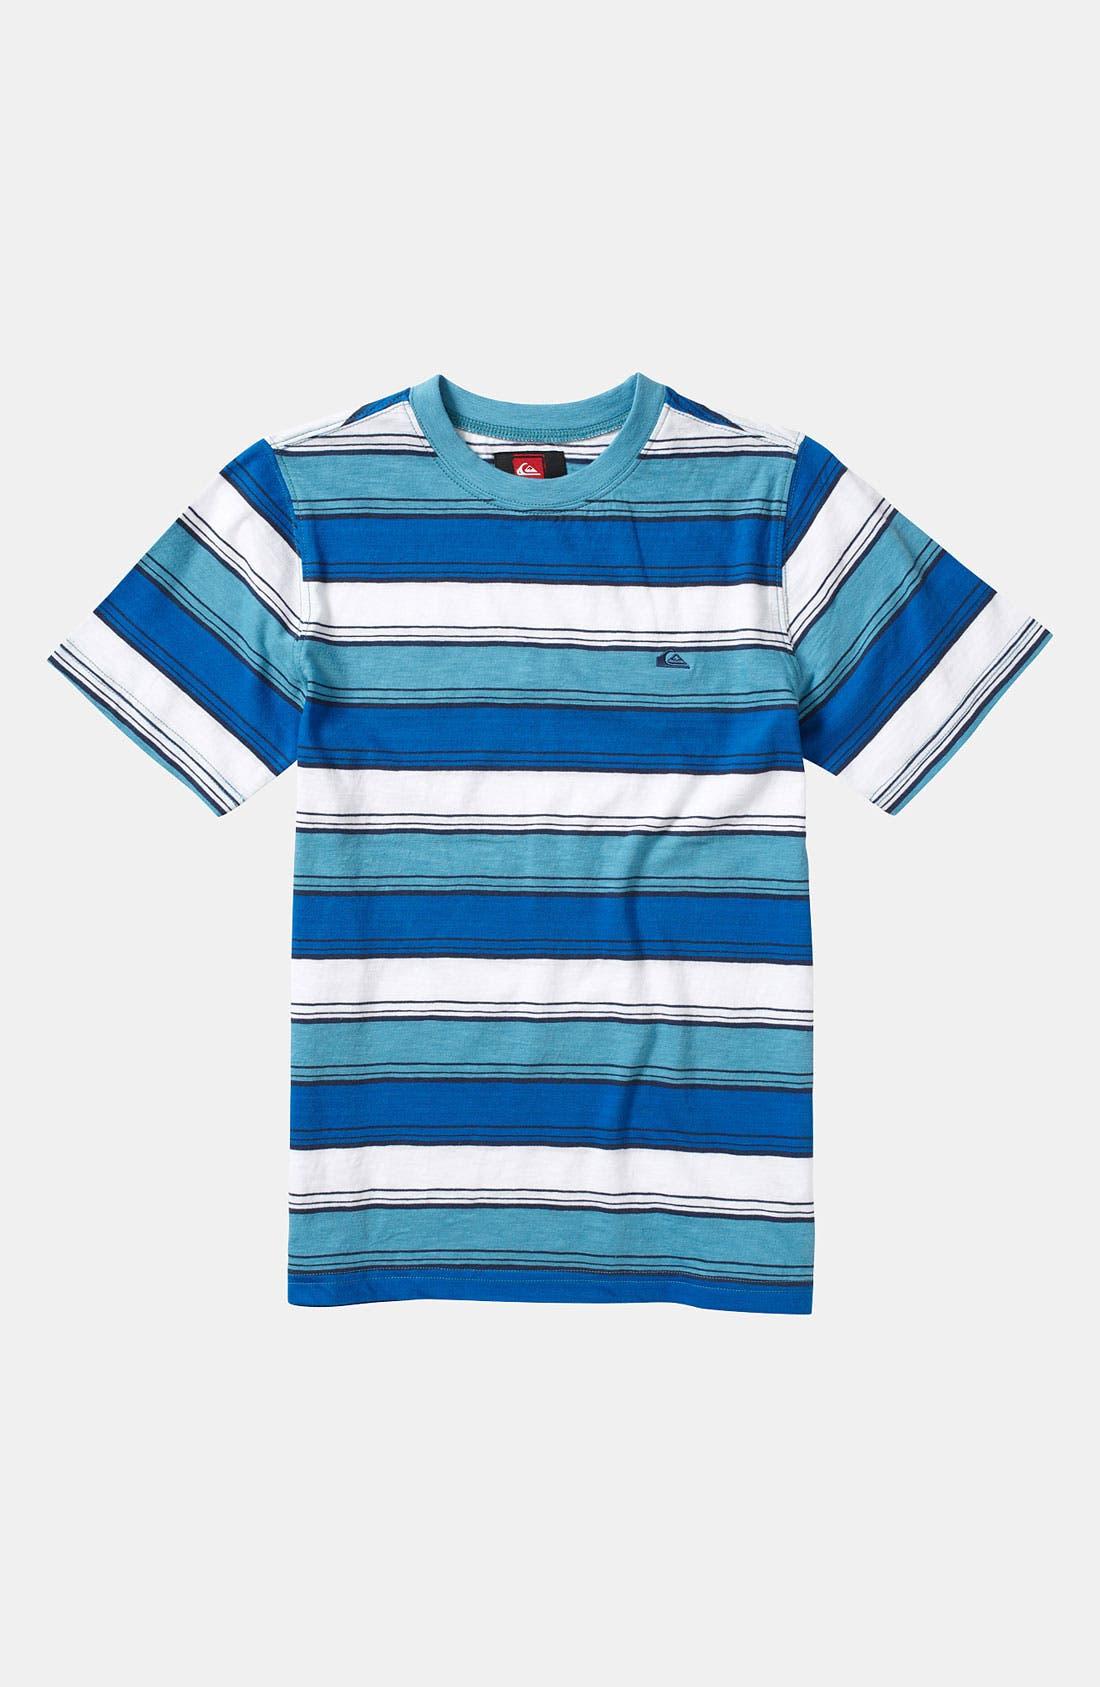 Alternate Image 1 Selected - Quiksilver 'Downside' Stripe Shirt (Toddler)